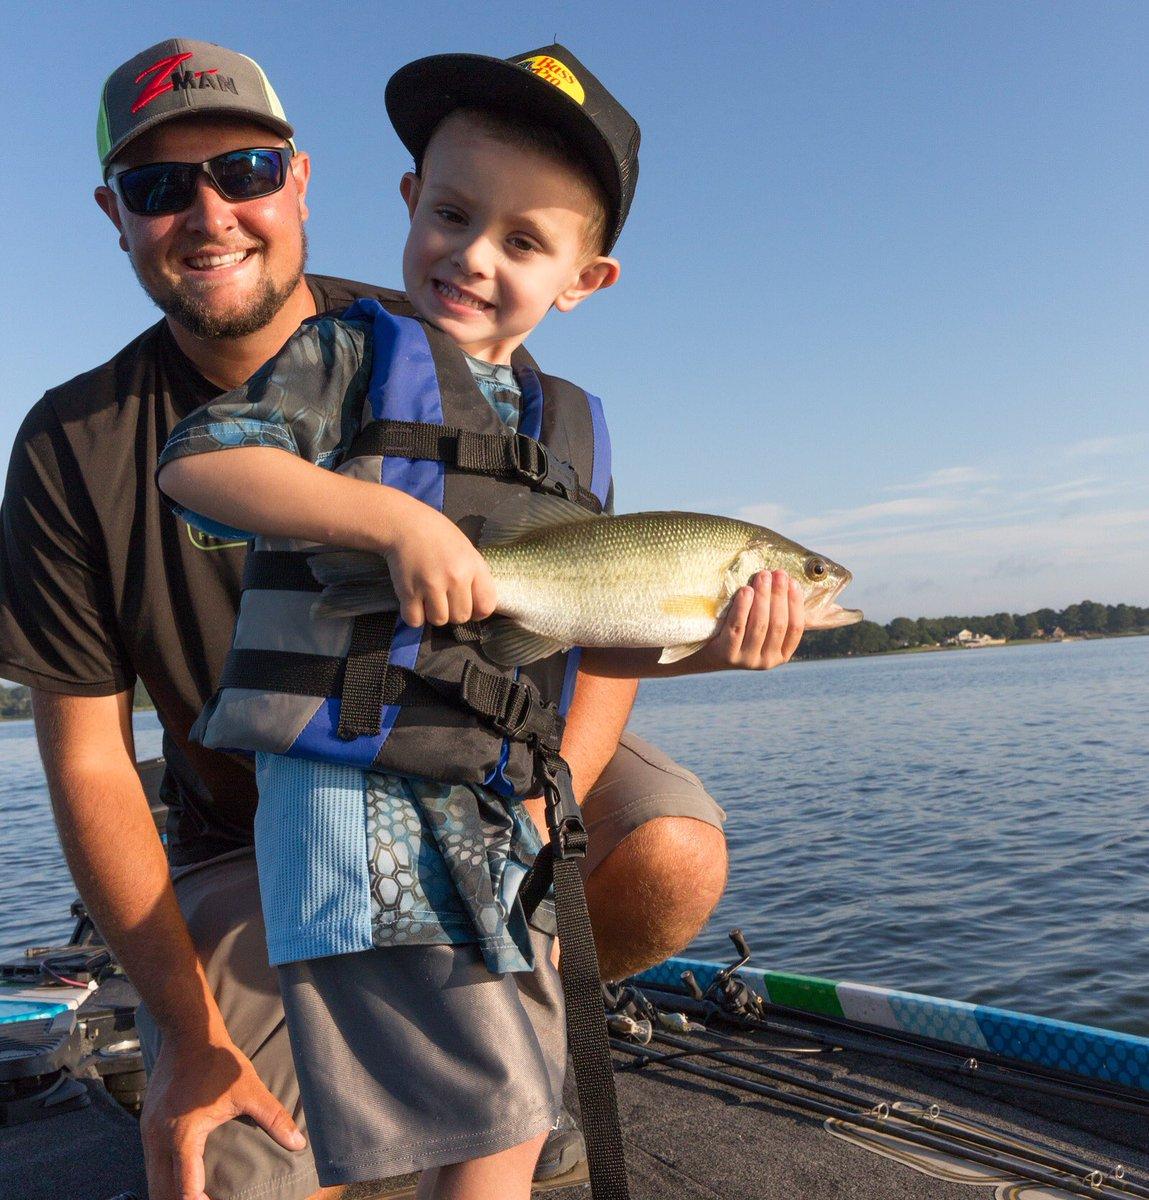 Making memories one catch at a time! #fishsweetwater #bassfishing #fishingfamily #makingmemories  @Zmanfishing  @BassProShops  @HukGear<br>http://pic.twitter.com/uE1bGvLpwh